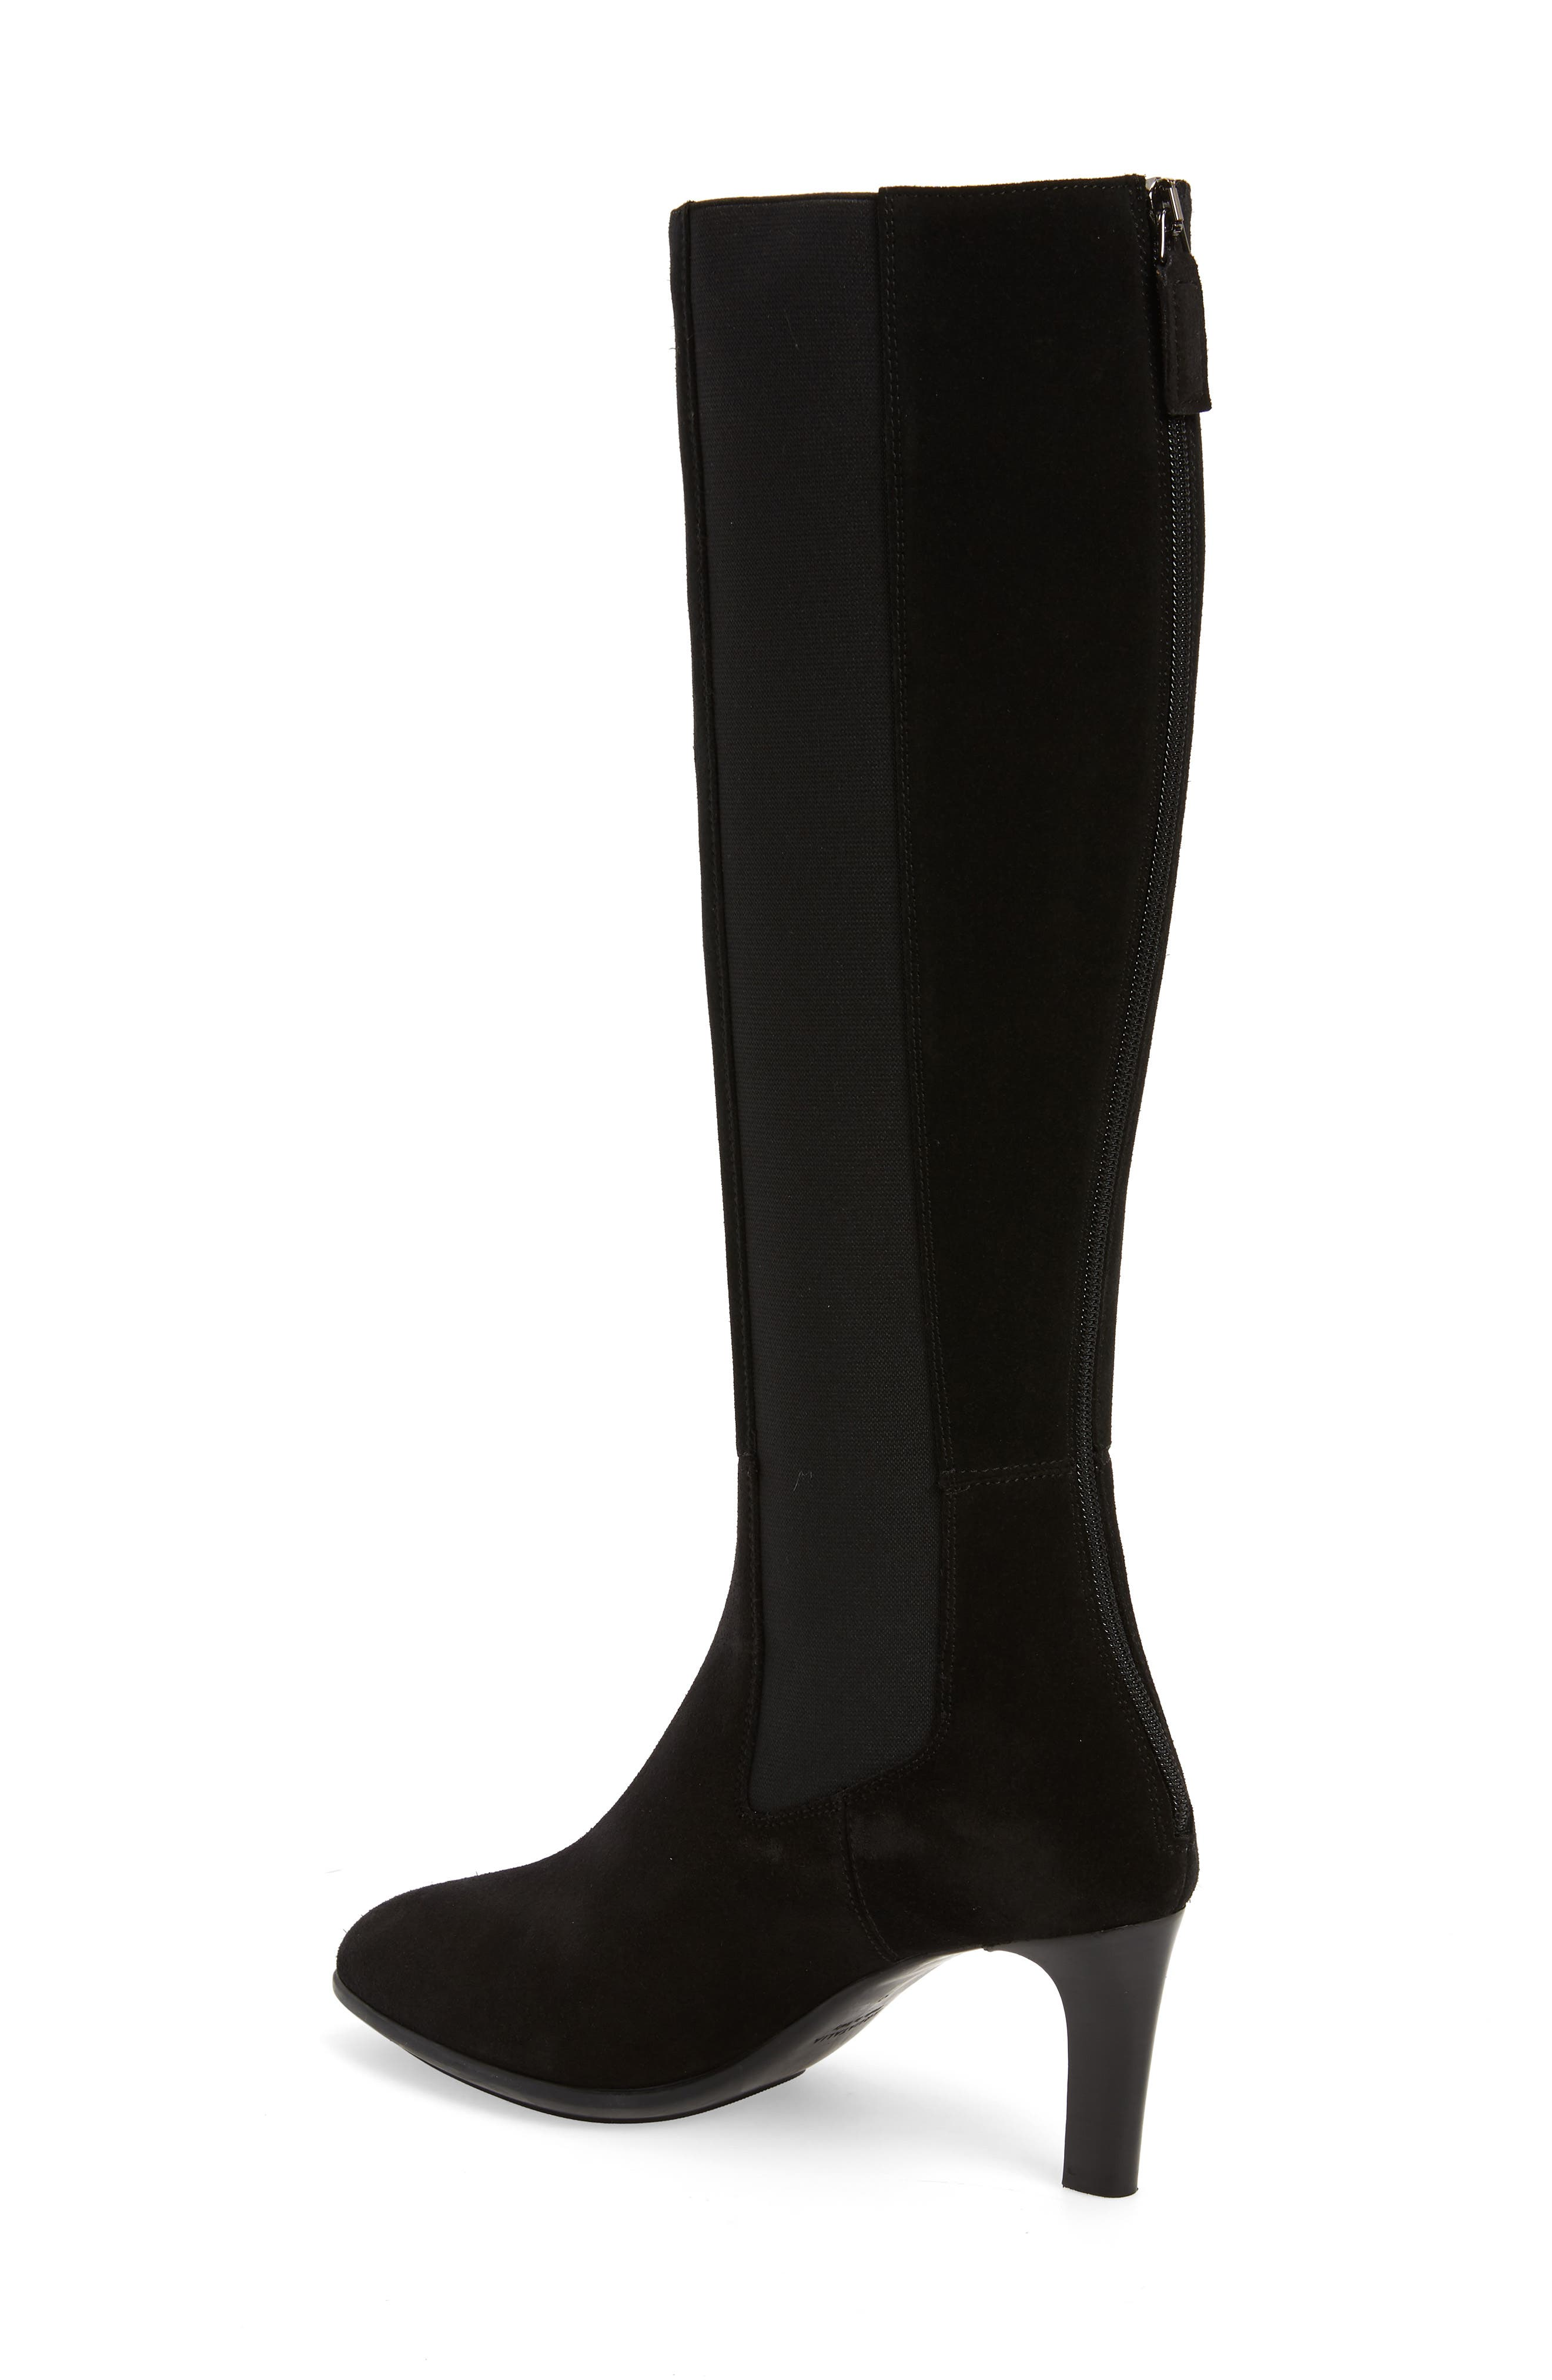 AQUATALIA, Dahliana Weatherproof Knee High Boot, Alternate thumbnail 2, color, BLACK